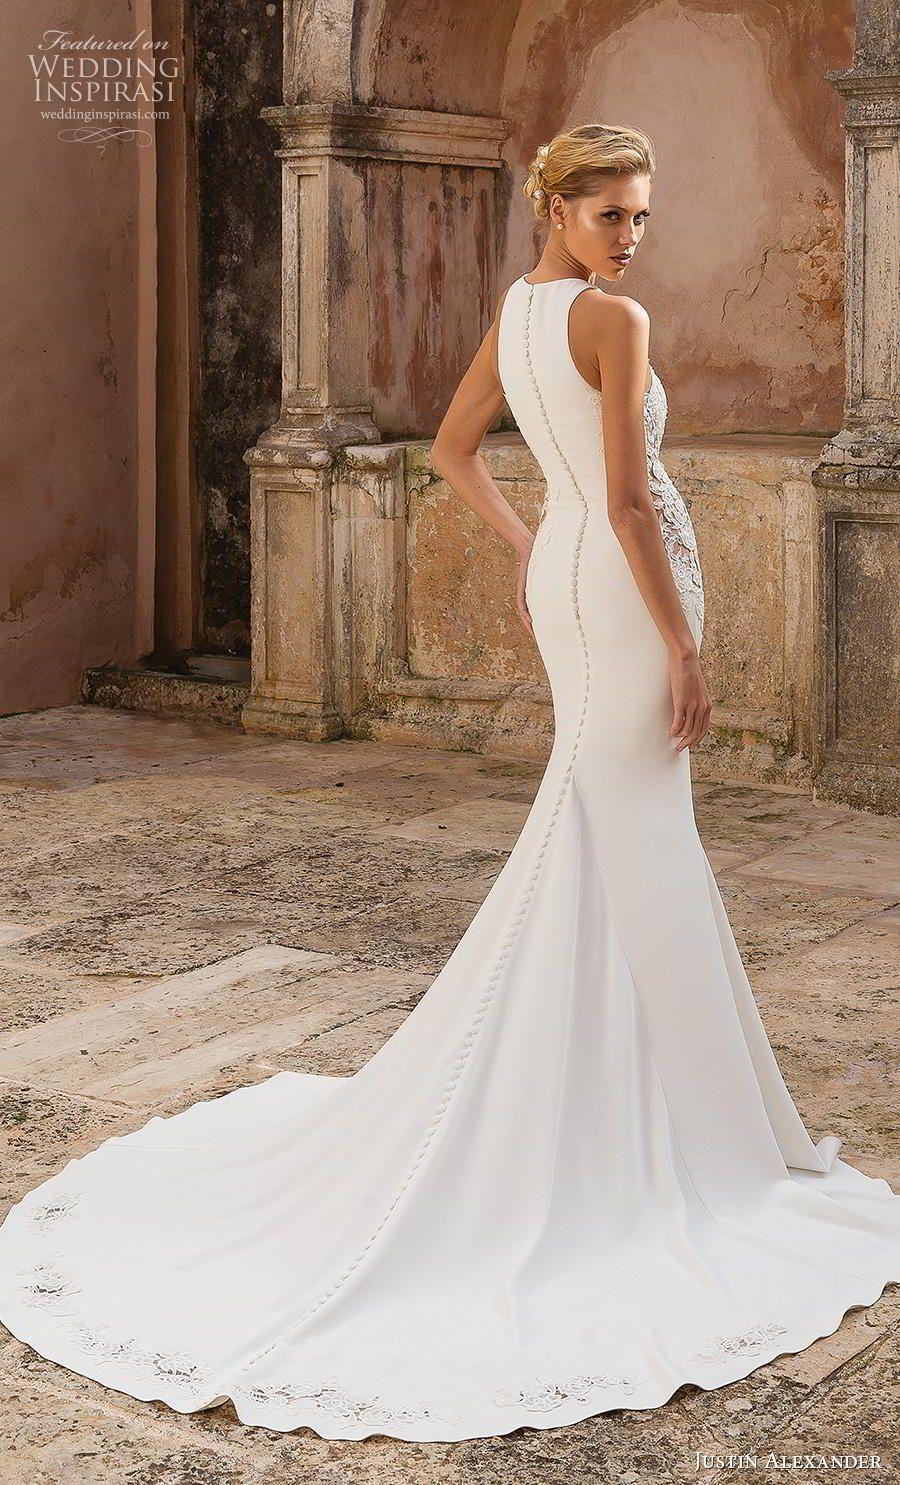 Justin Alexander Spring 2019 Wedding Dresses Wedding Inspirasi Justin Alexander Wedding Dress Fit And Flare Wedding Dress Satin Mermaid Wedding Dress [ 1485 x 900 Pixel ]